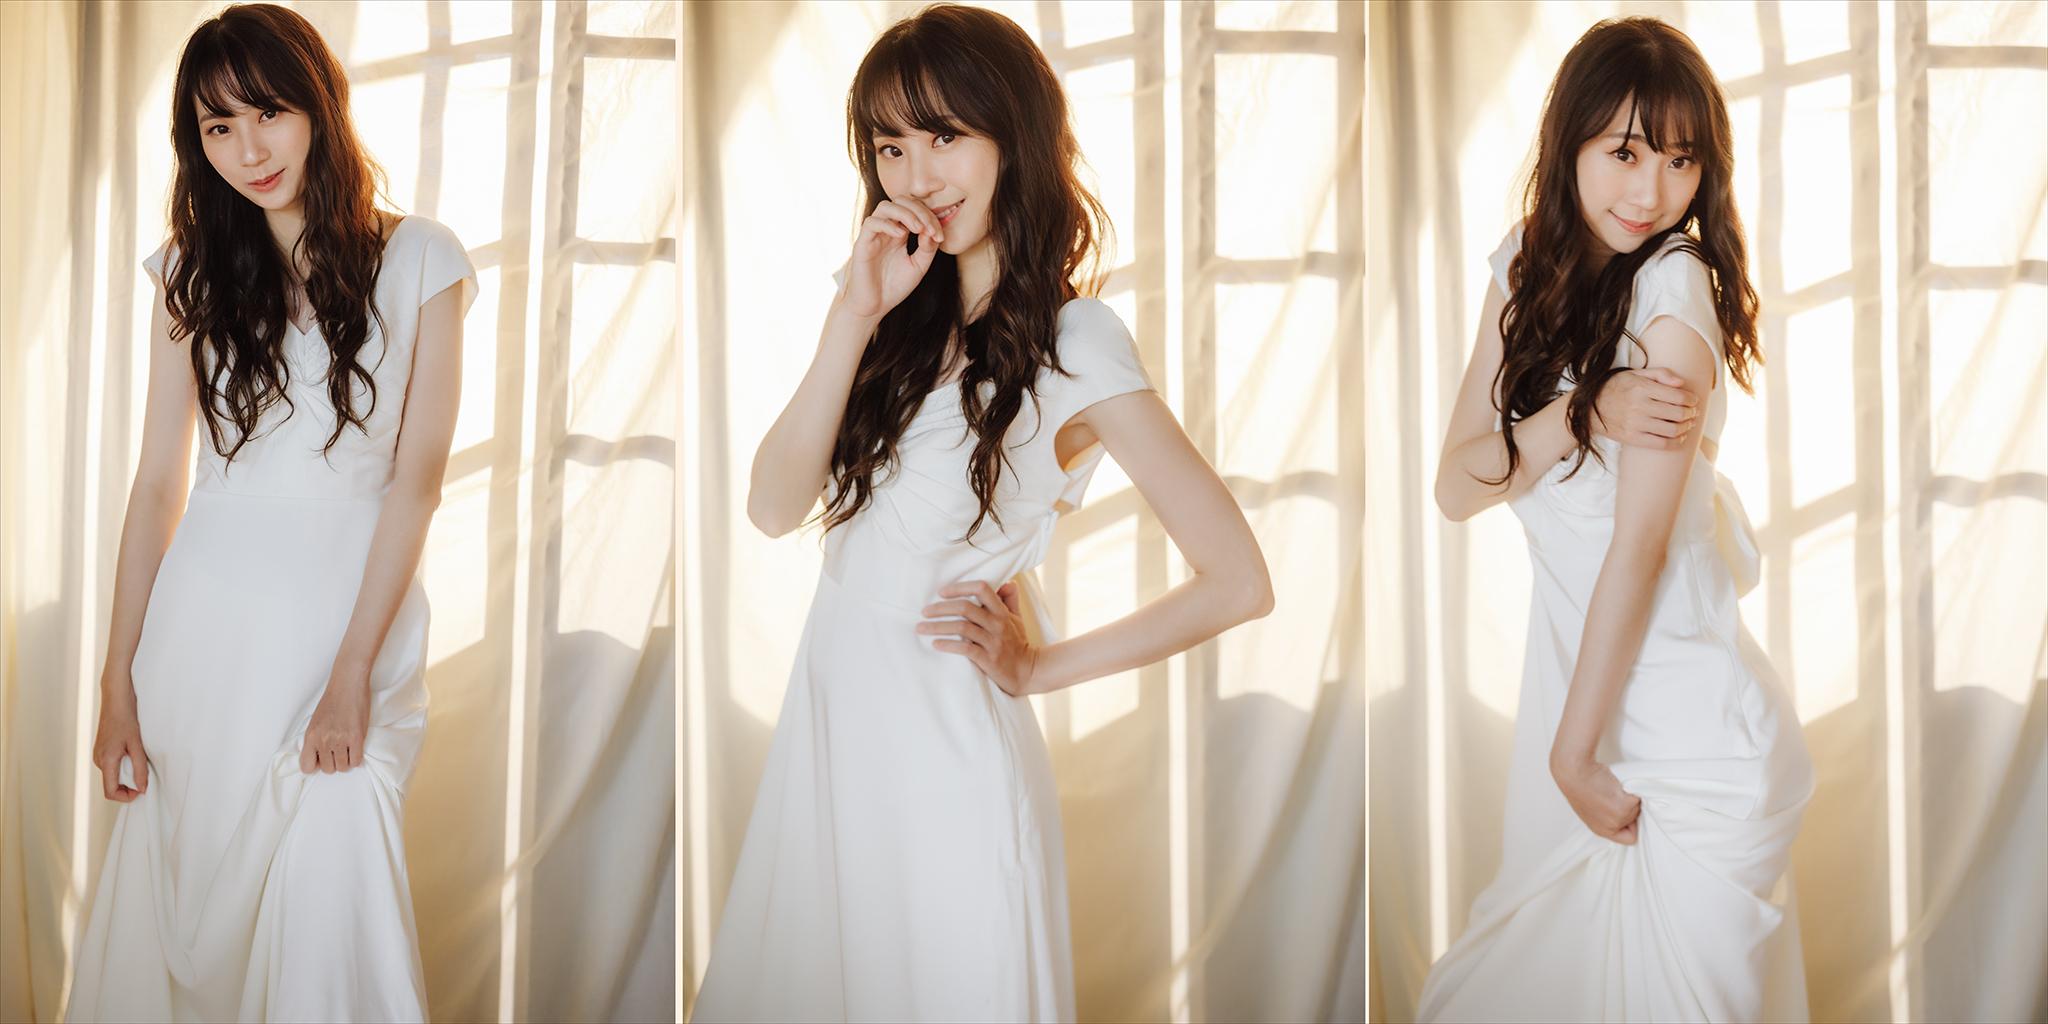 50660110077 44ec34022a o - 【自主婚紗】+Melody+